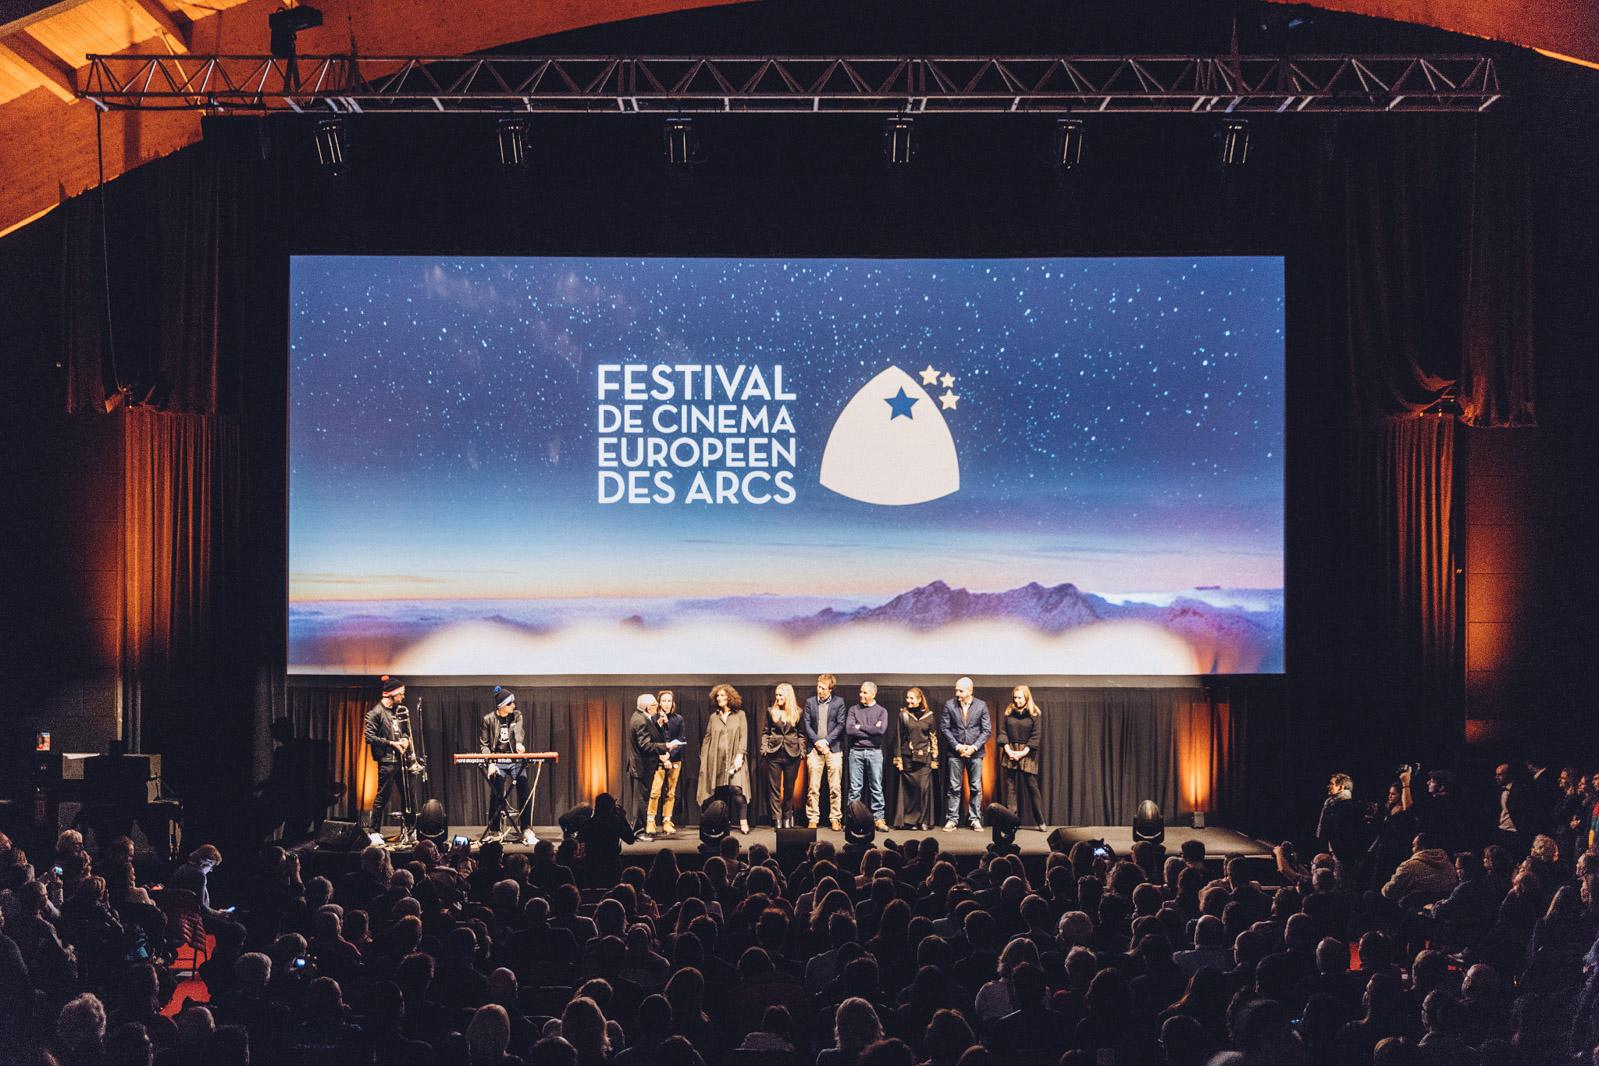 Festival du film europeen Les Arcs blog voyage Sisley Paris l Photo Sebastian Erras l La Fiancee du Panda blog mariage et lifestyle-2